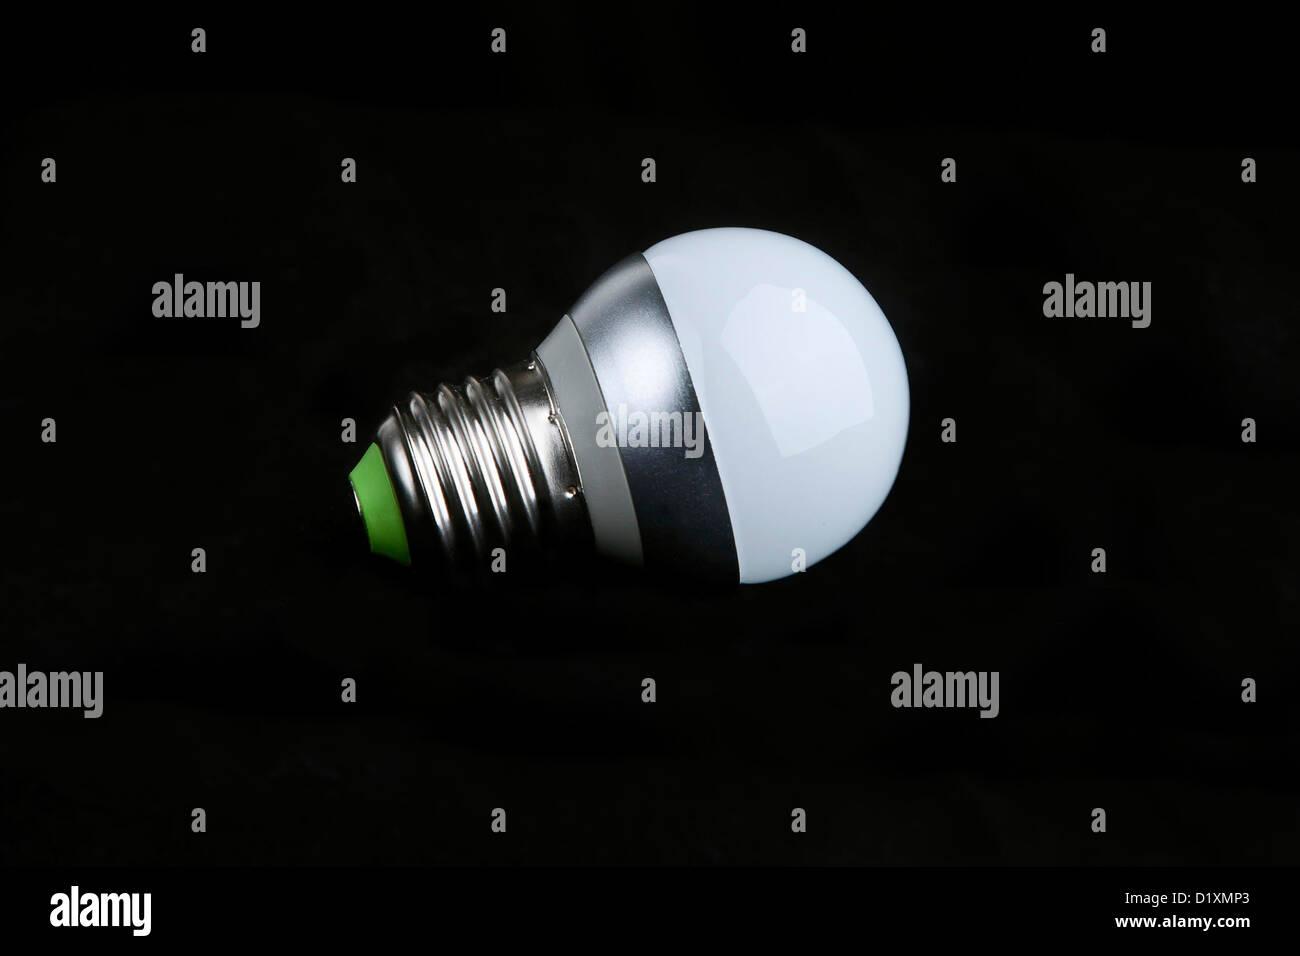 A single LED lamp. - Stock Image